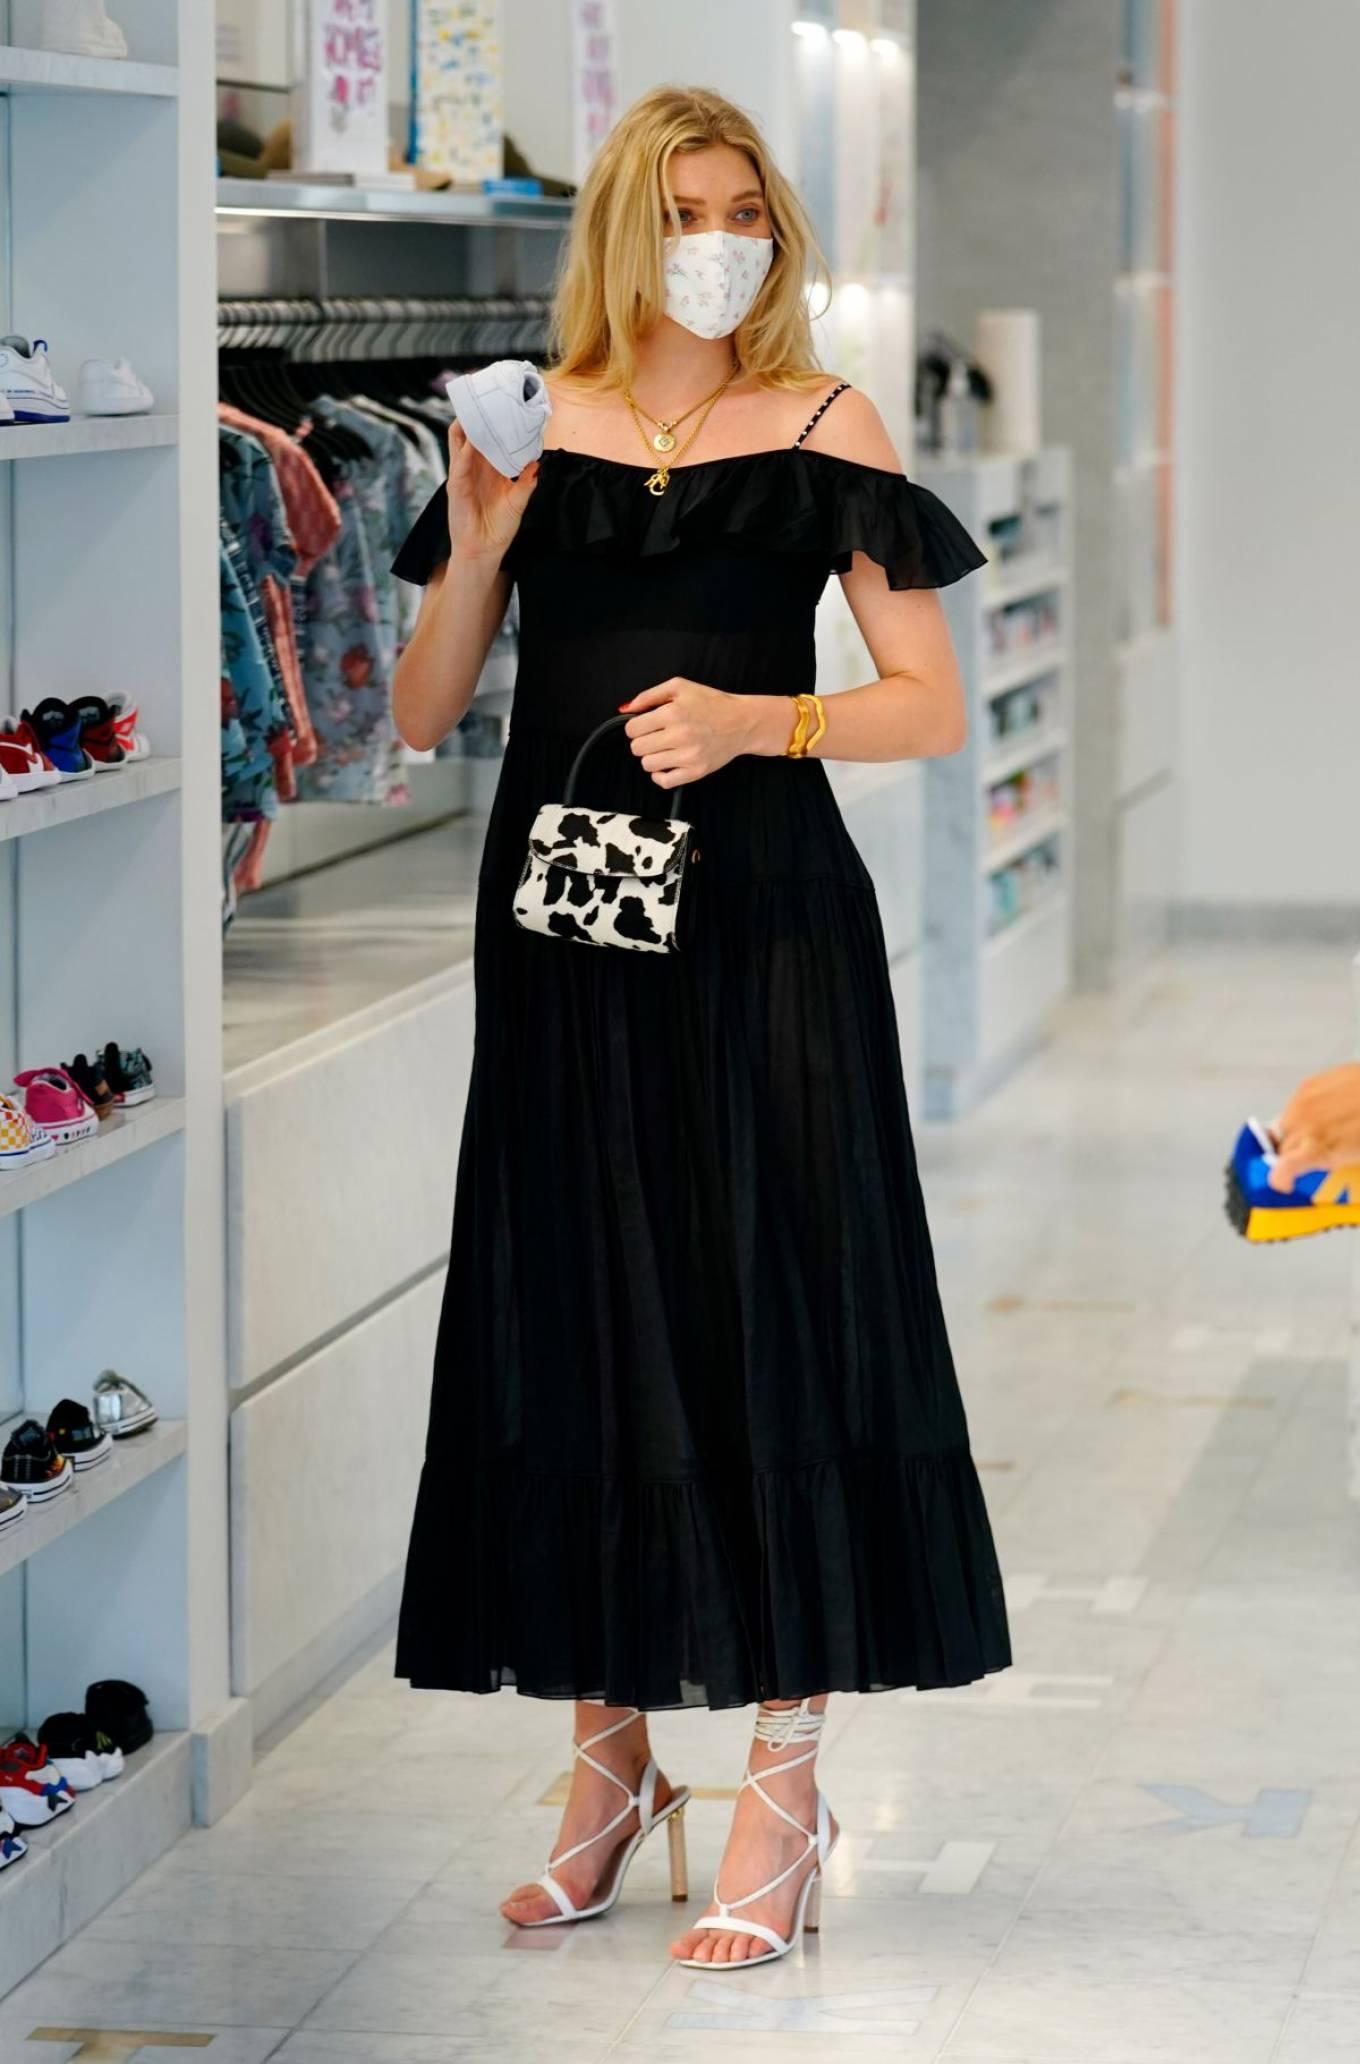 Elsa Hosk 2020 : Elsa Hosk – Wearing mask while out for shopping in New York-06